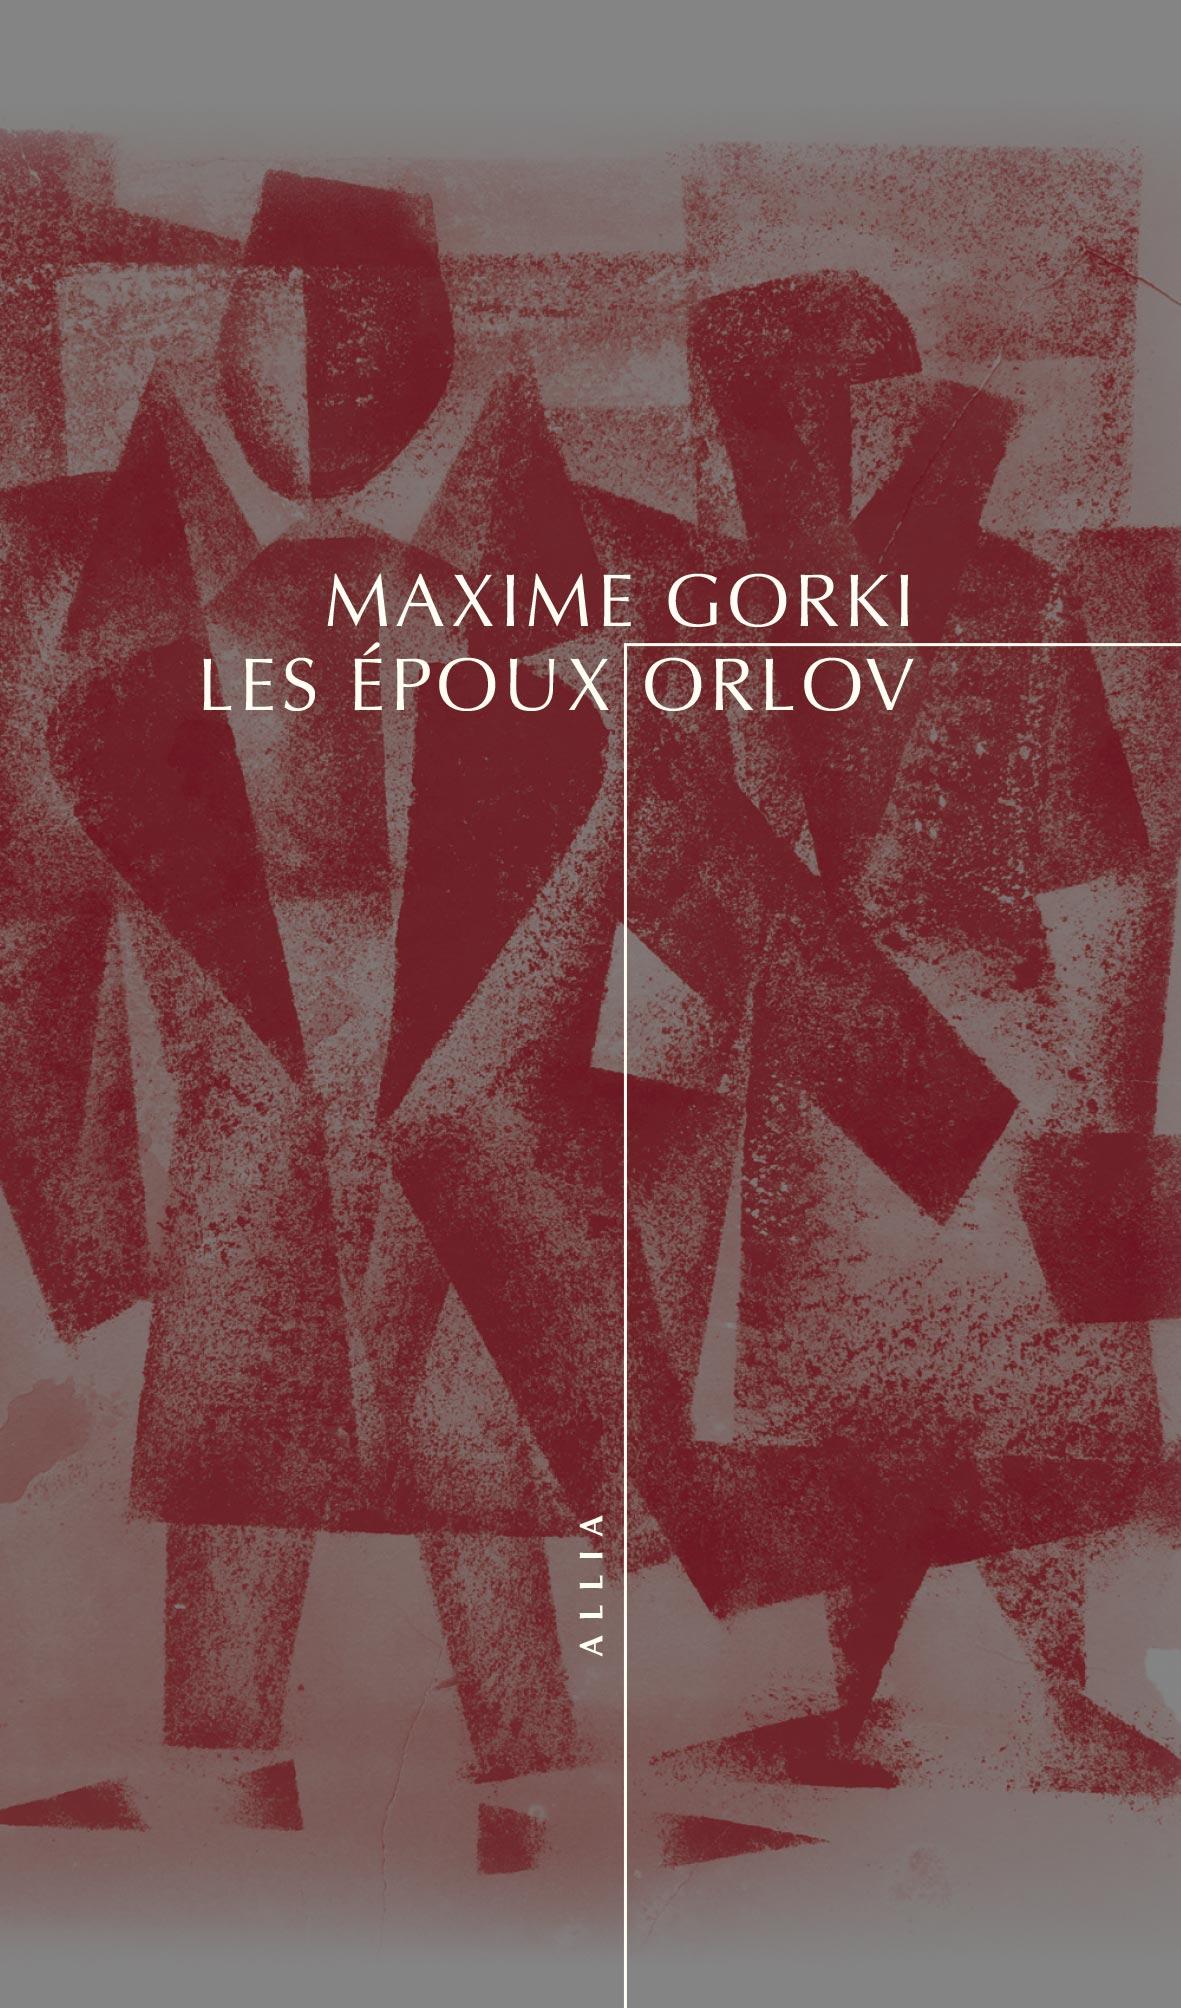 Les époux Orlov, Gorki, Maxime